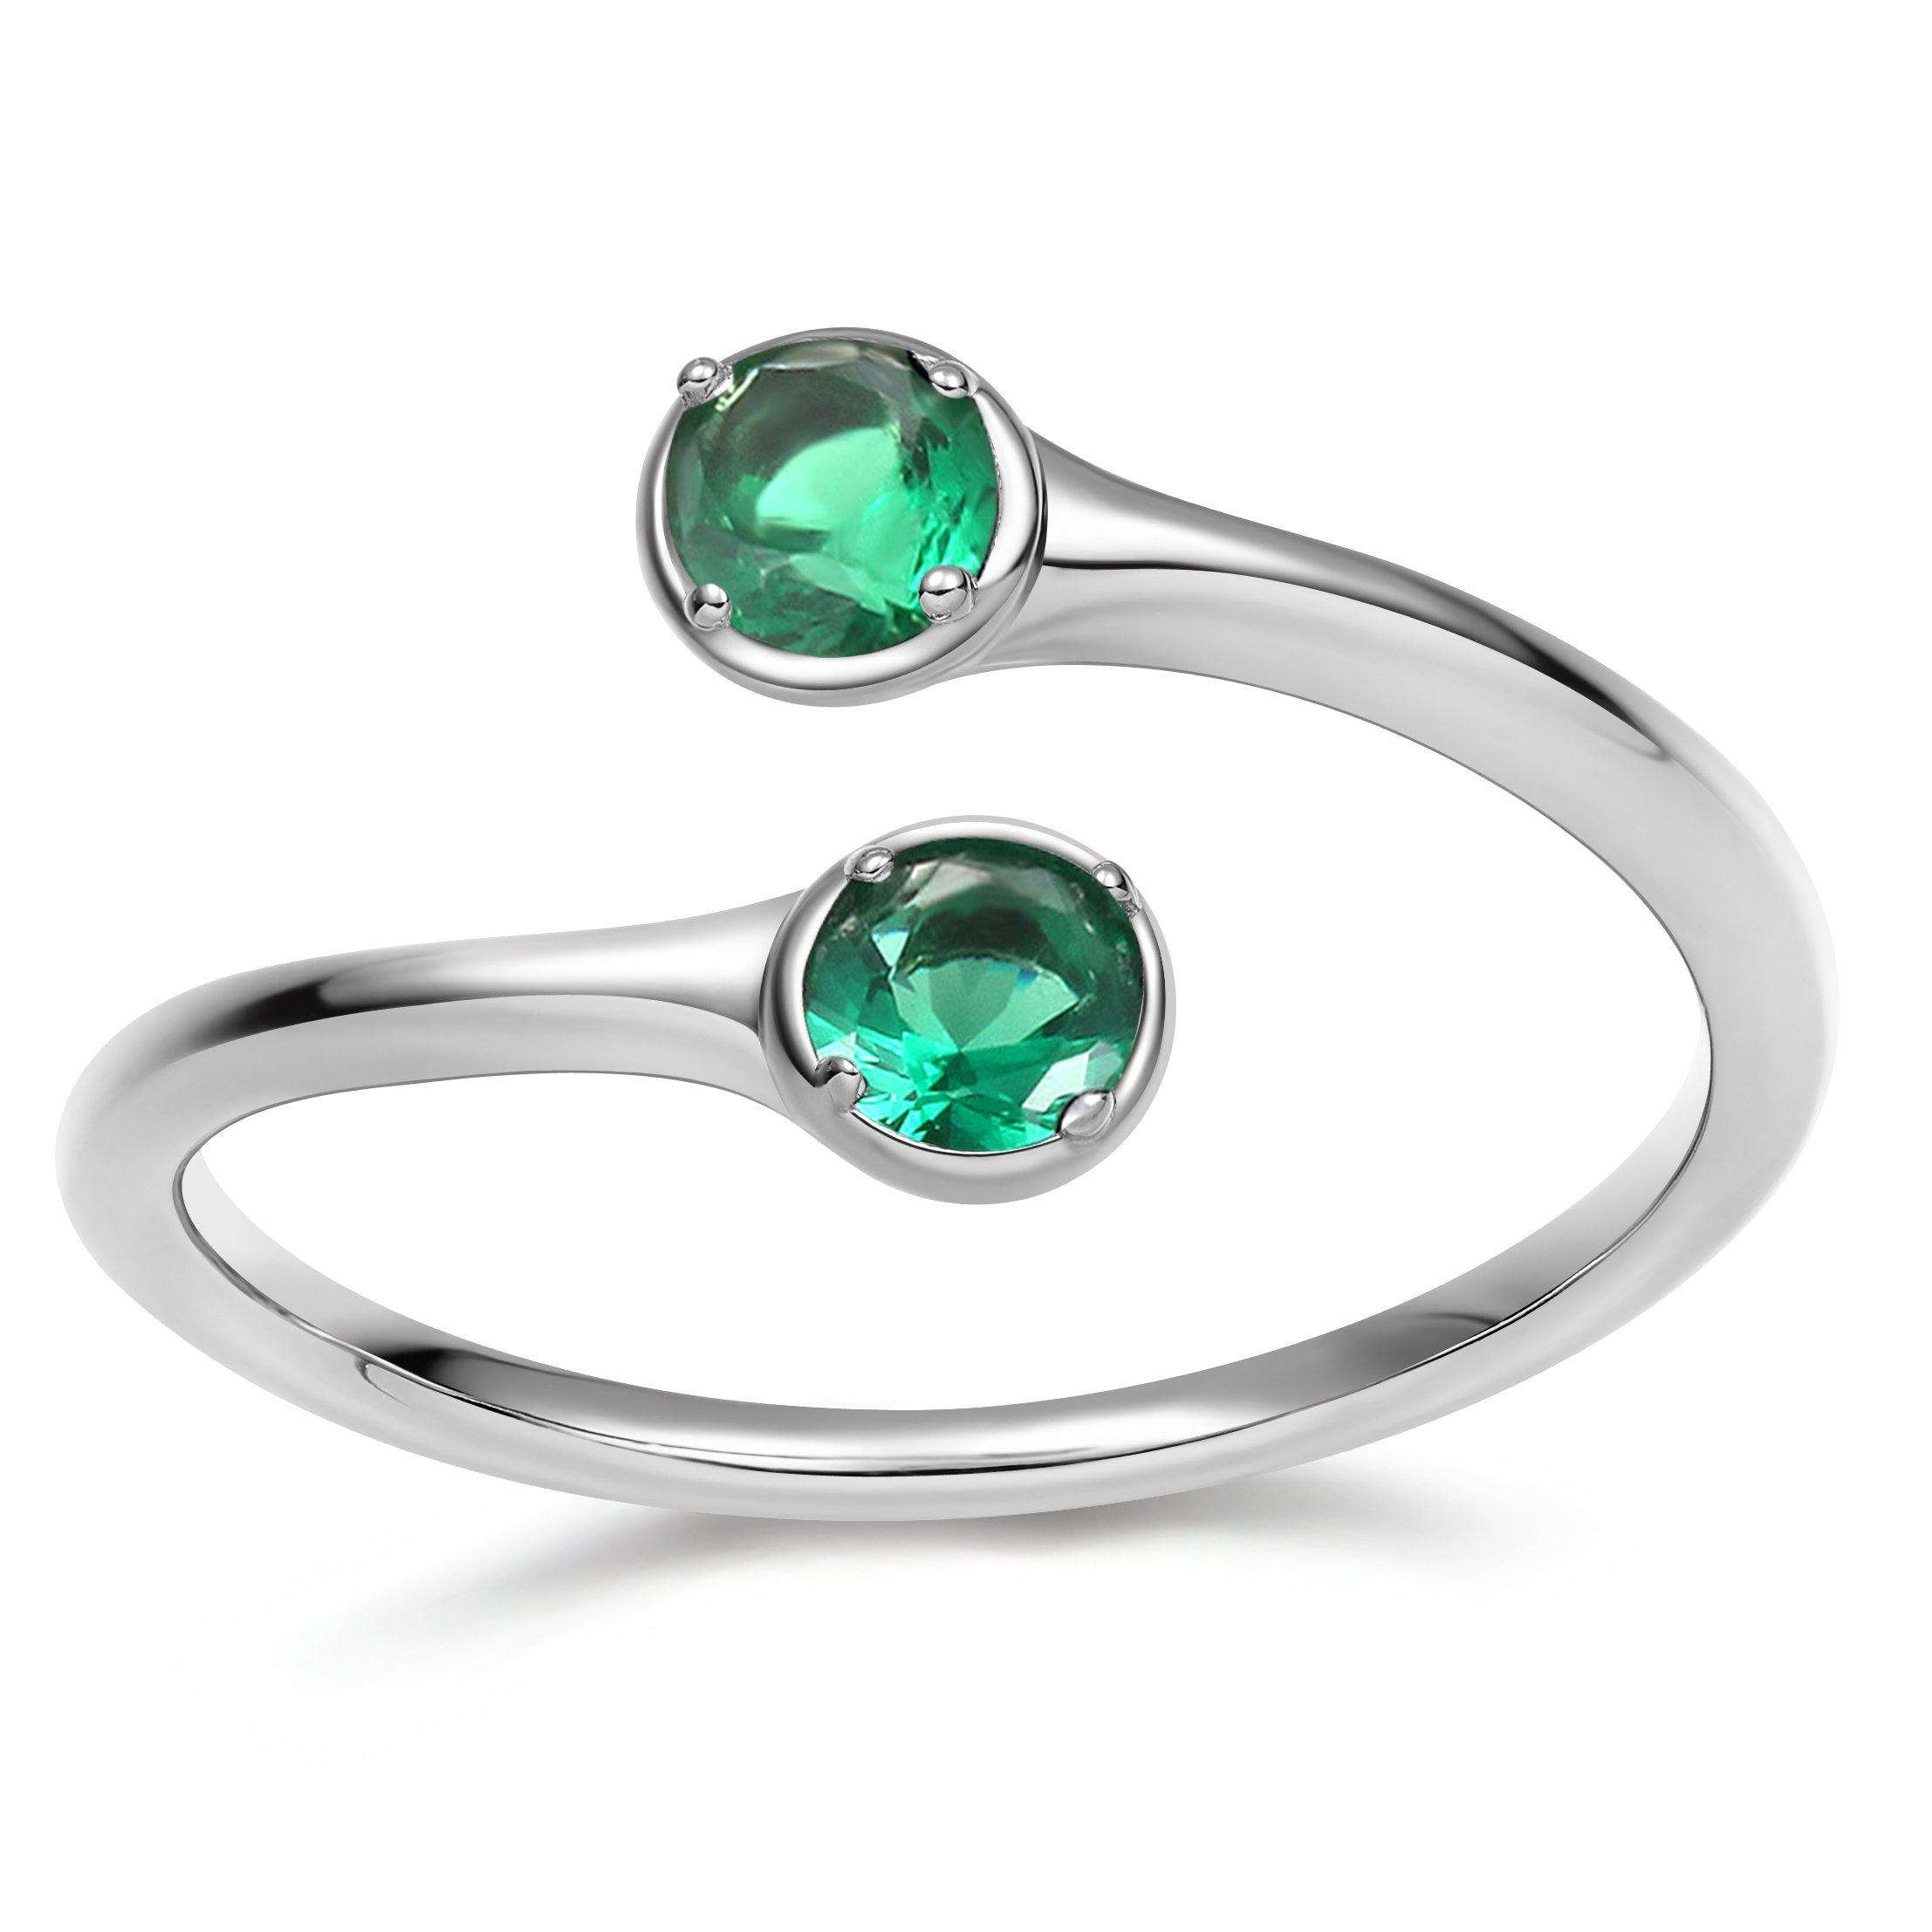 EAMTI Wrap Adjustable 925 Sterling Silver Emerald Cubic Zirconia May Birthstone Wedding Engagement Ring